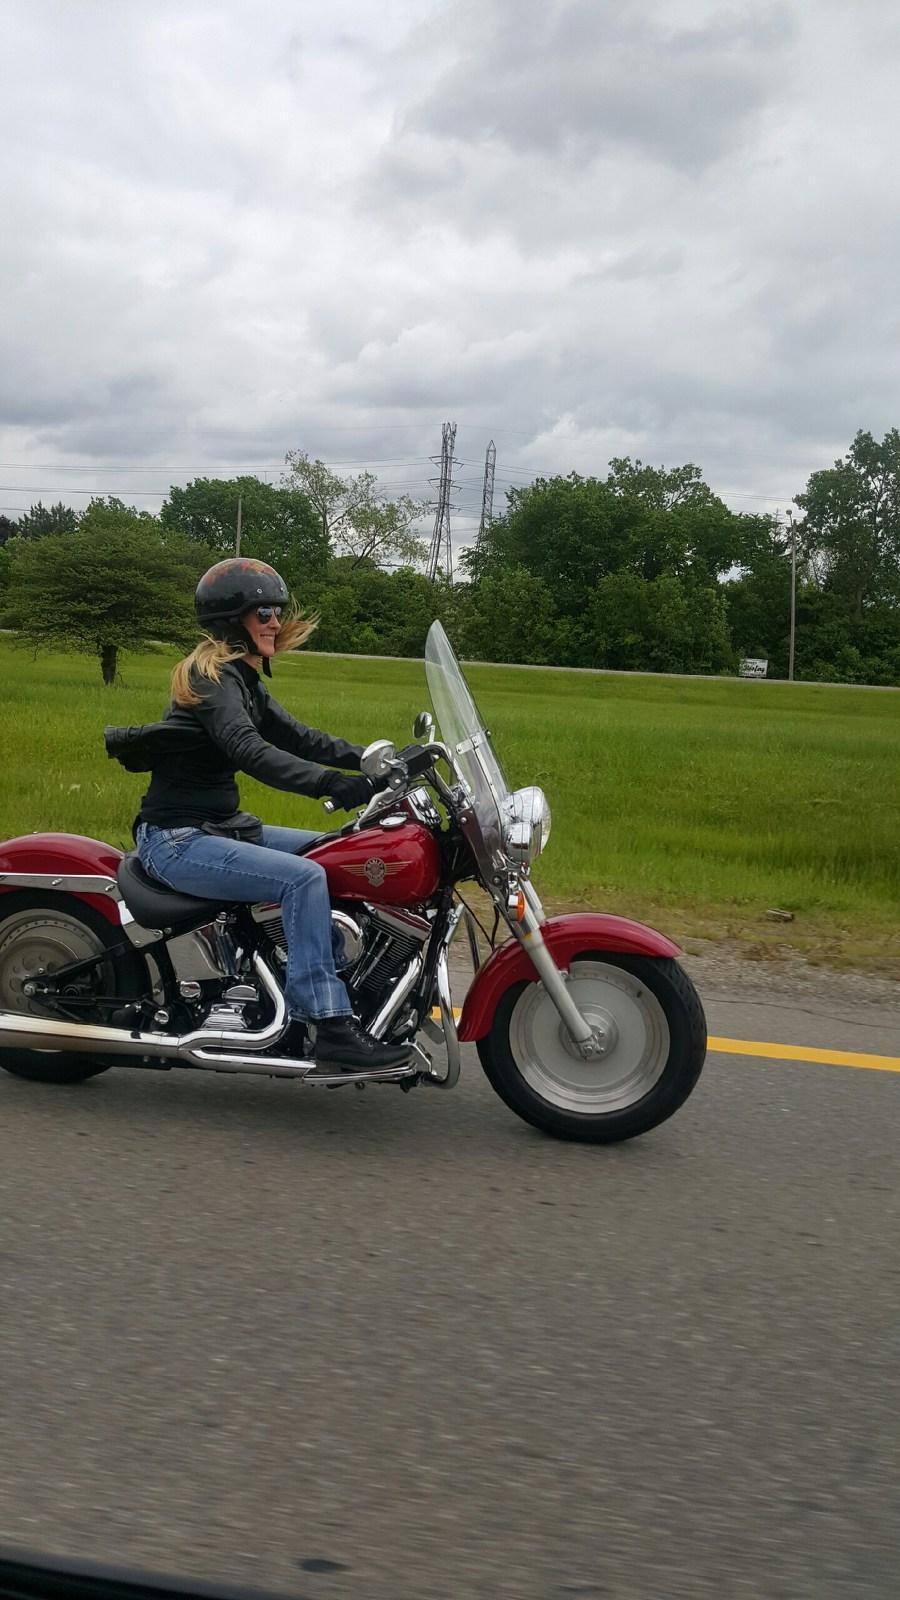 Riding my Harley